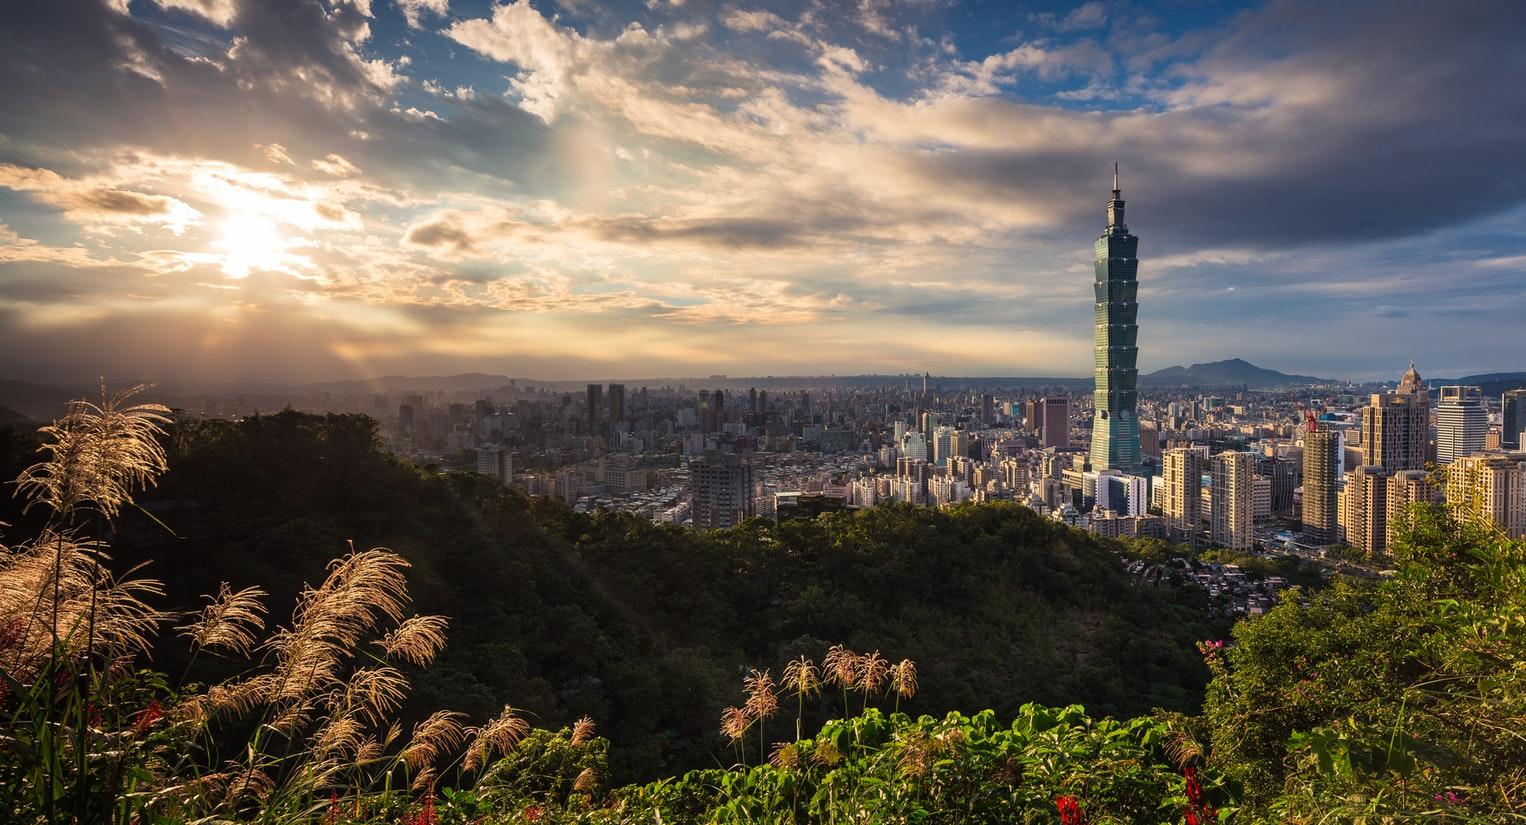 Blick auf Taipei 101 und Skyline in Taipei Taiwan